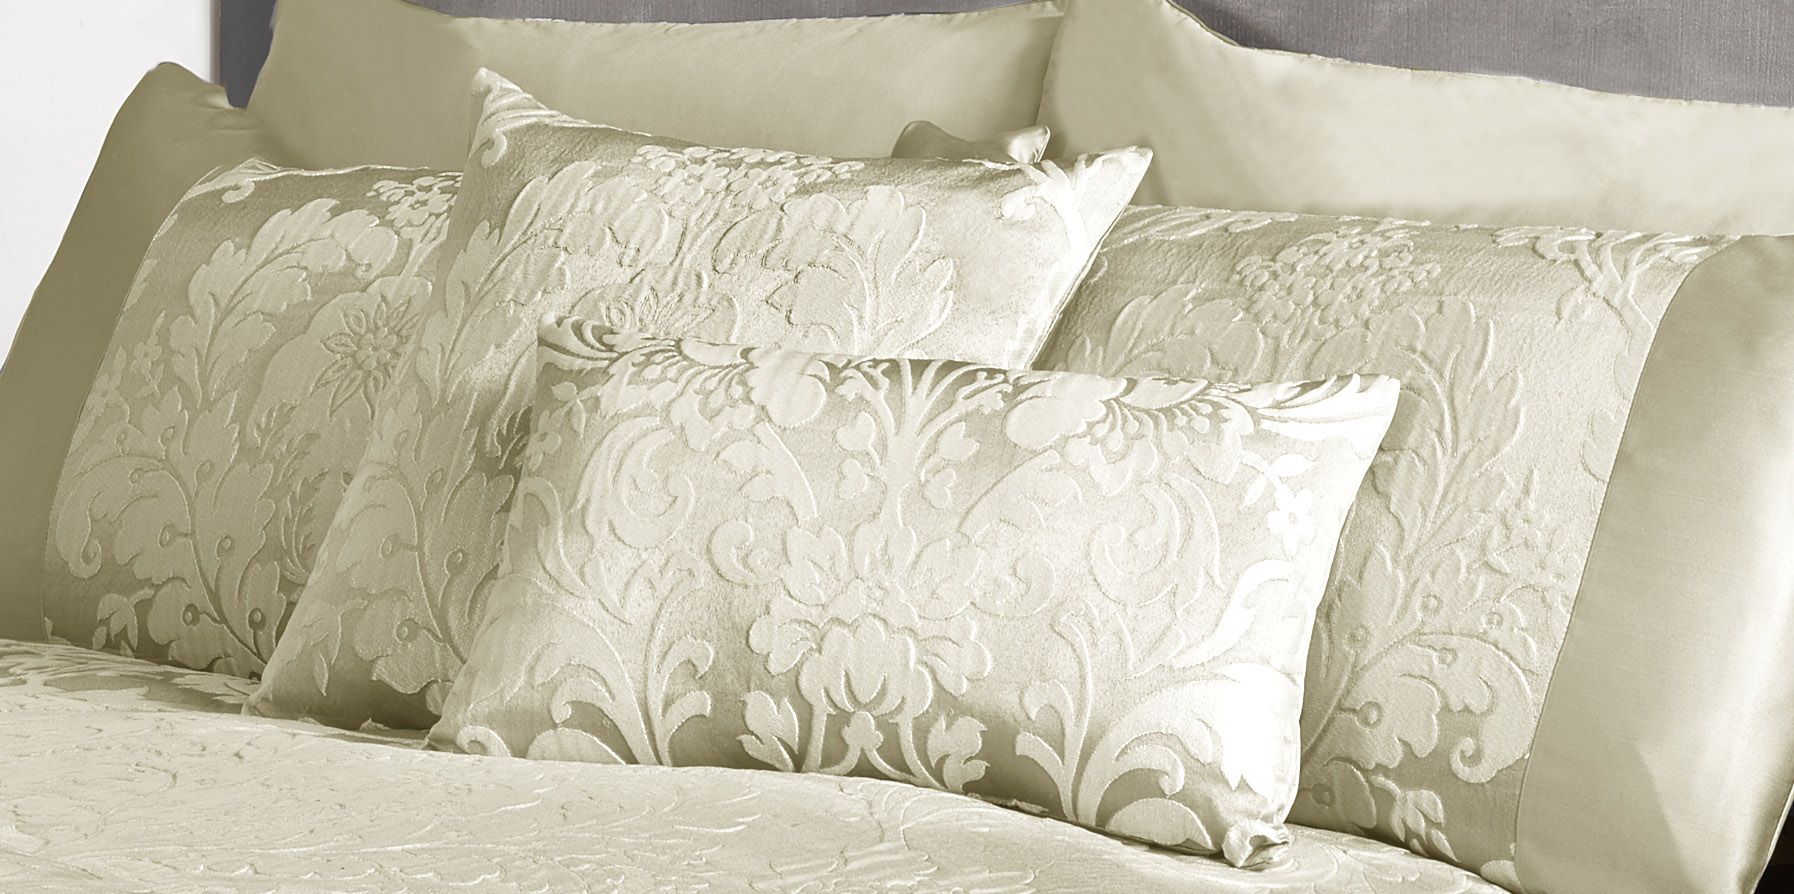 Luxury Charleston Jacquard Damask Filled Boudoir Cushion in Cream